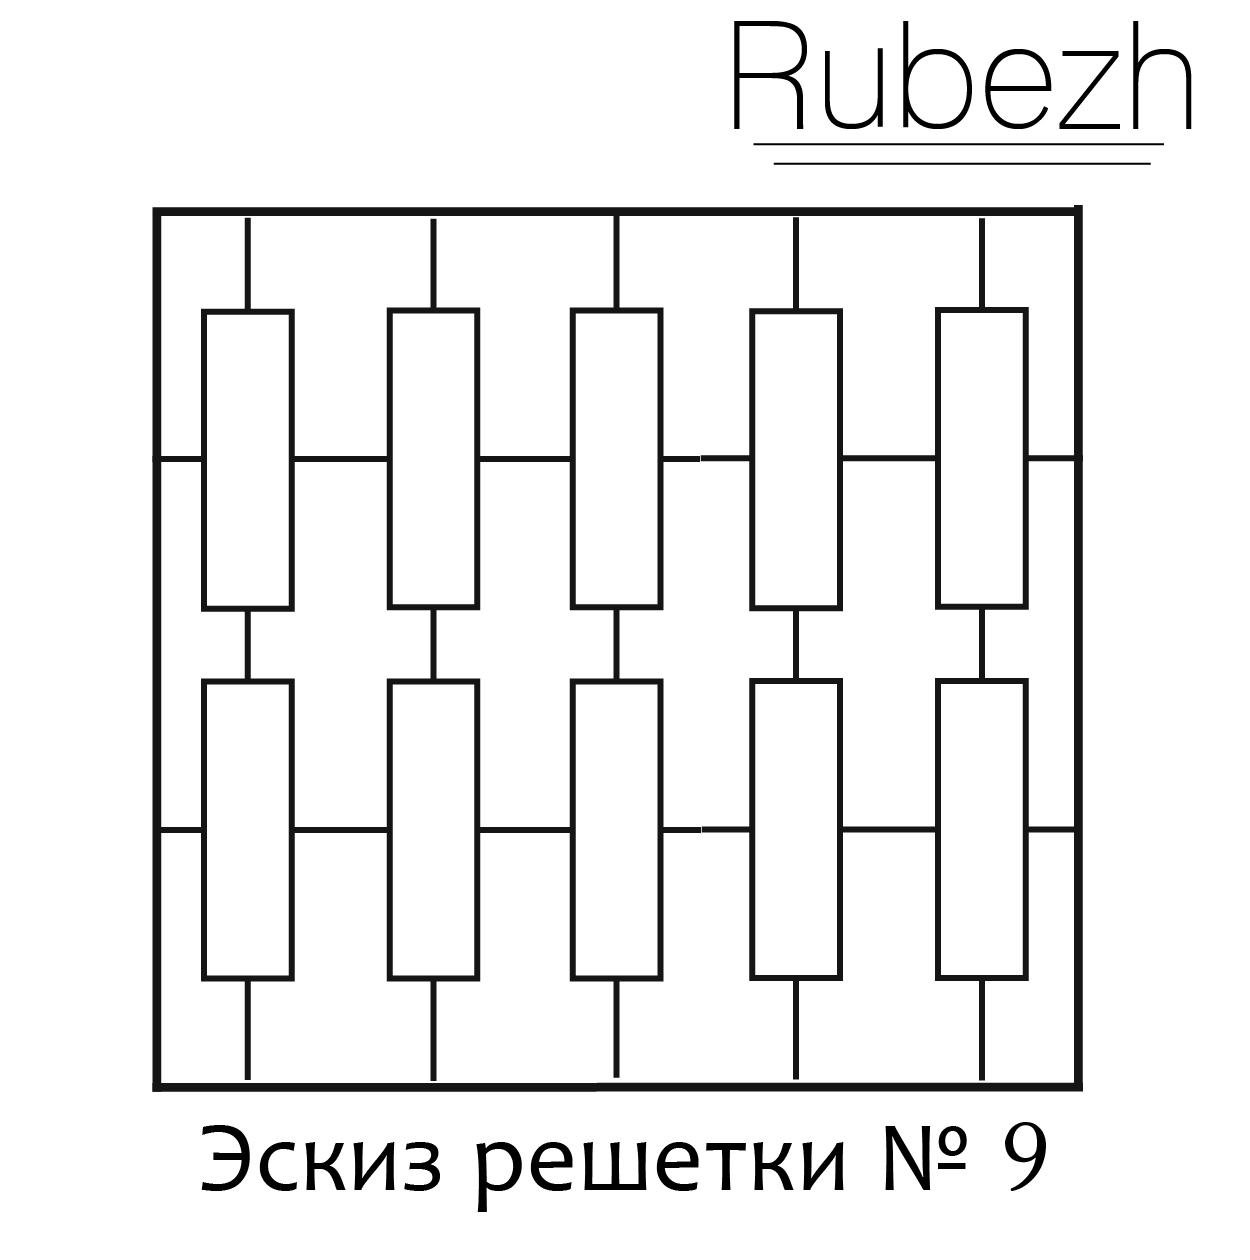 Эскиз решетки № 9